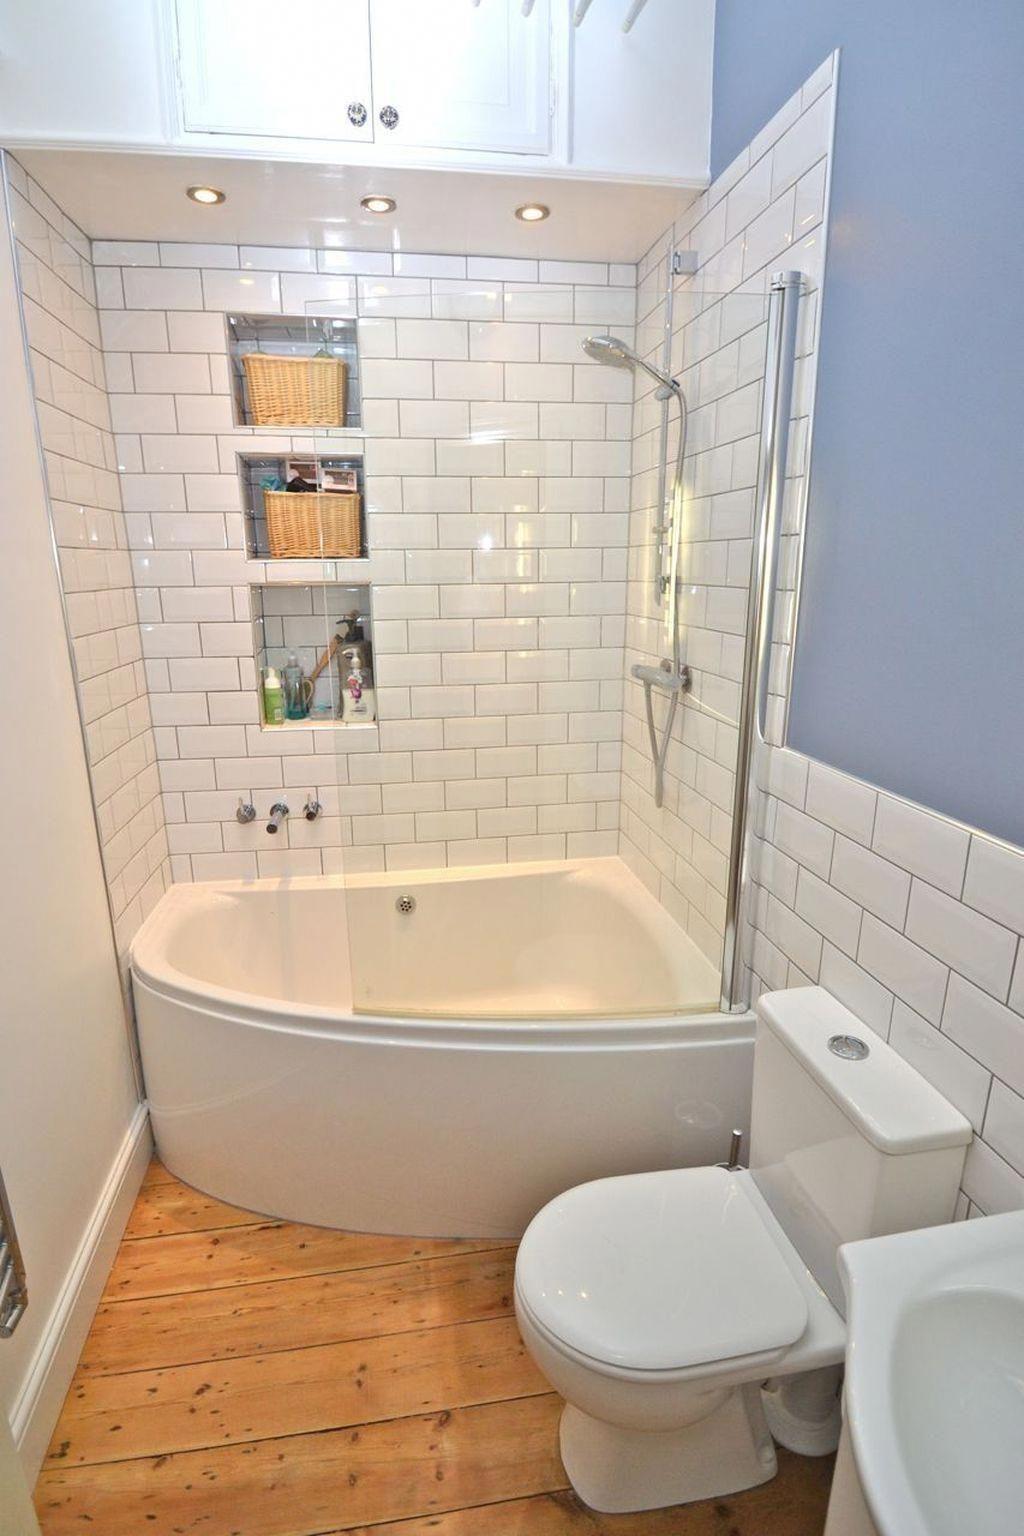 Nice 46 Smart Bathroom Design Ideas For Small Spaces. # ... on Nice Bathroom Designs For Small Spaces  id=71354